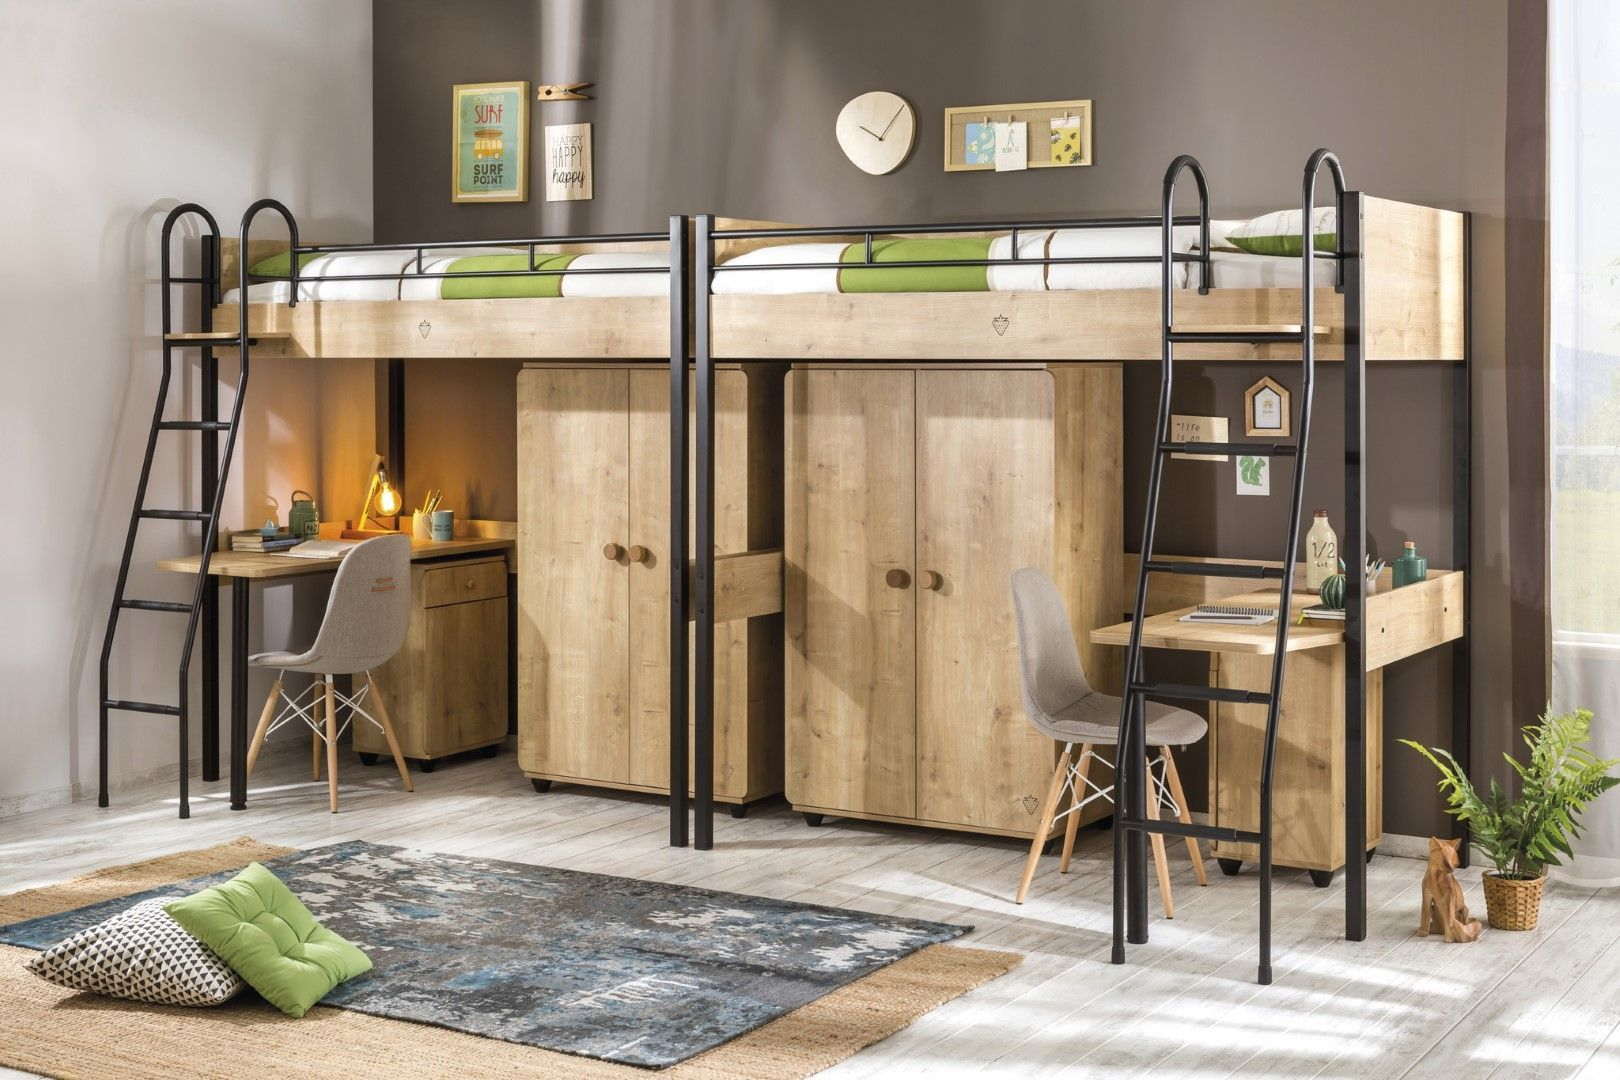 Inspiratie Kleine Kamer : Stockholm compact inspiratie kleine slaapkamer inspiratie